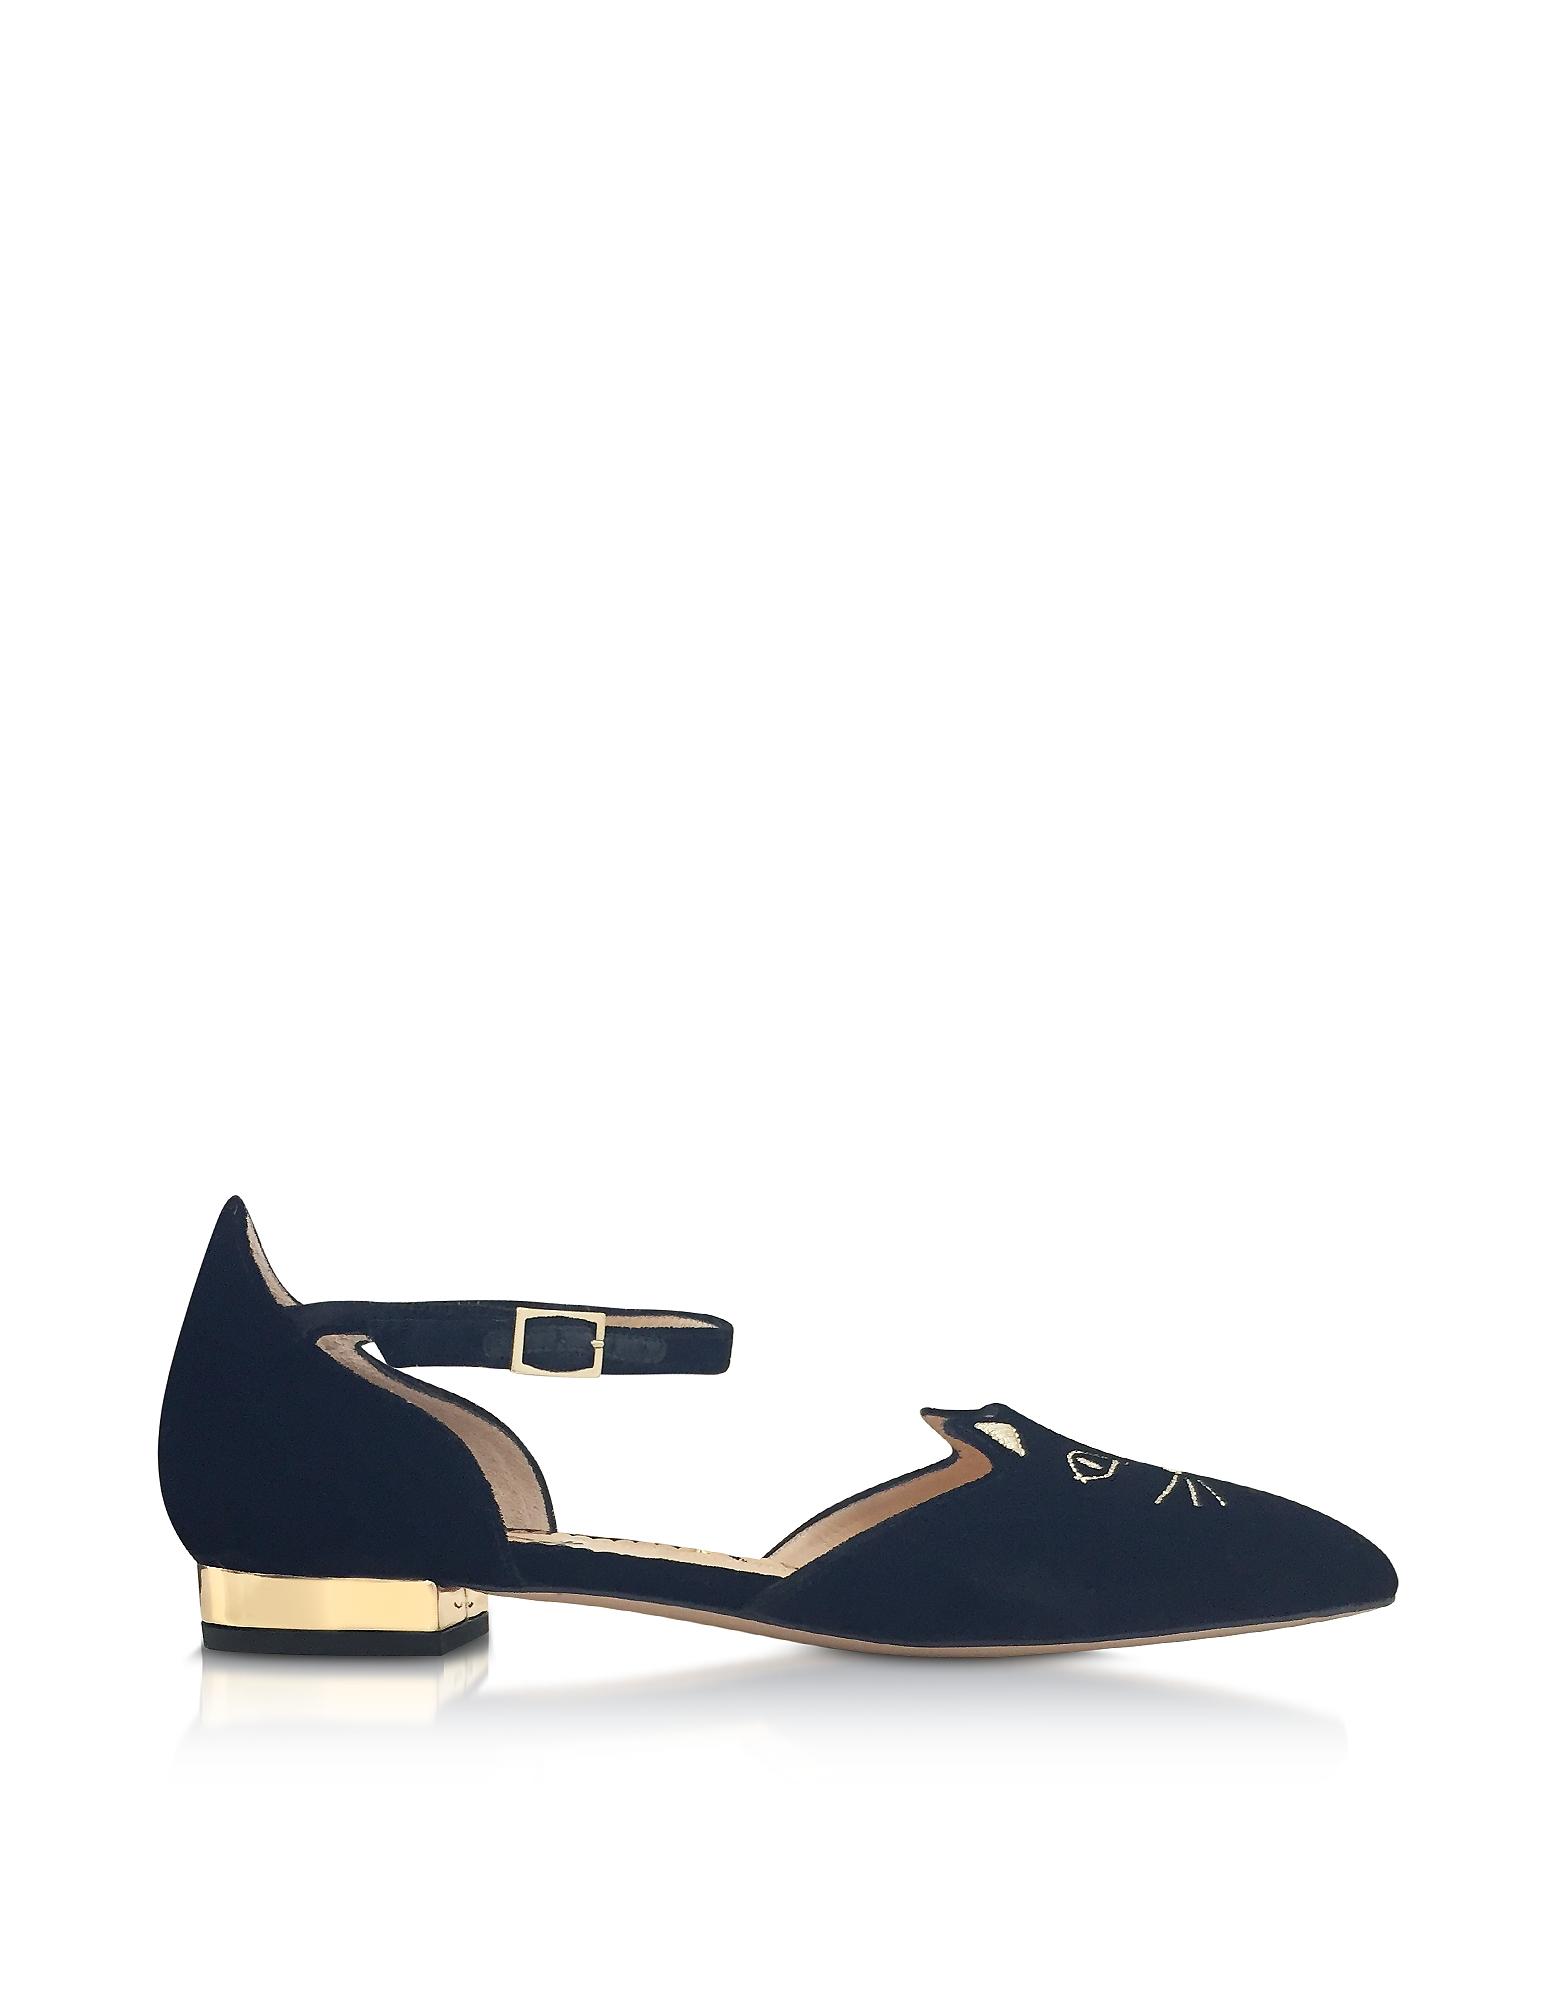 Charlotte Olympia Shoes, Black Velvet Mid-Century Kitty D'Orsay Flat Ballerinas